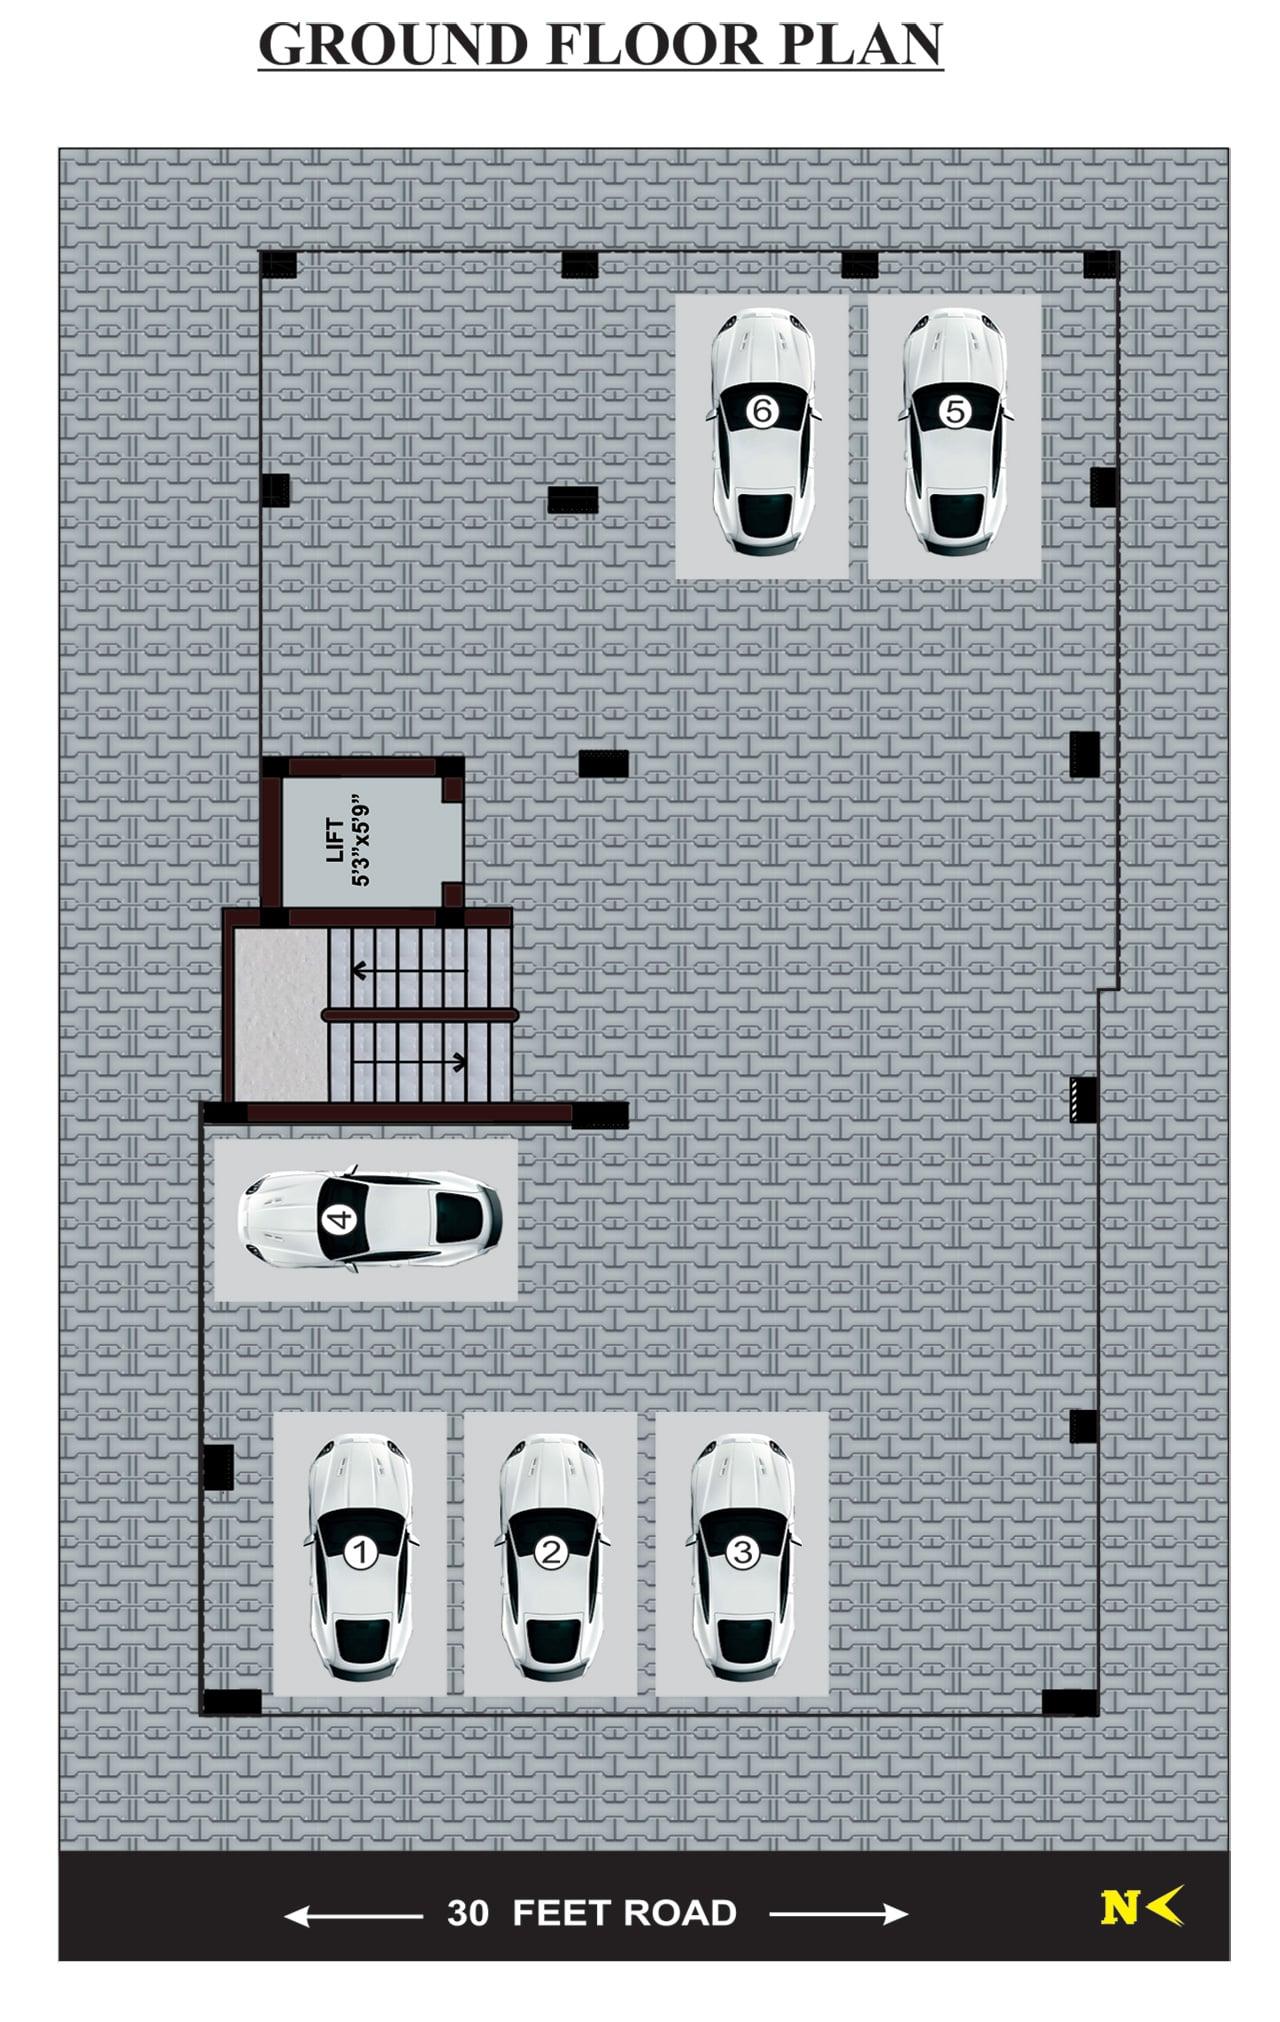 jkb-siddharth-enclave-ground-floor-plan